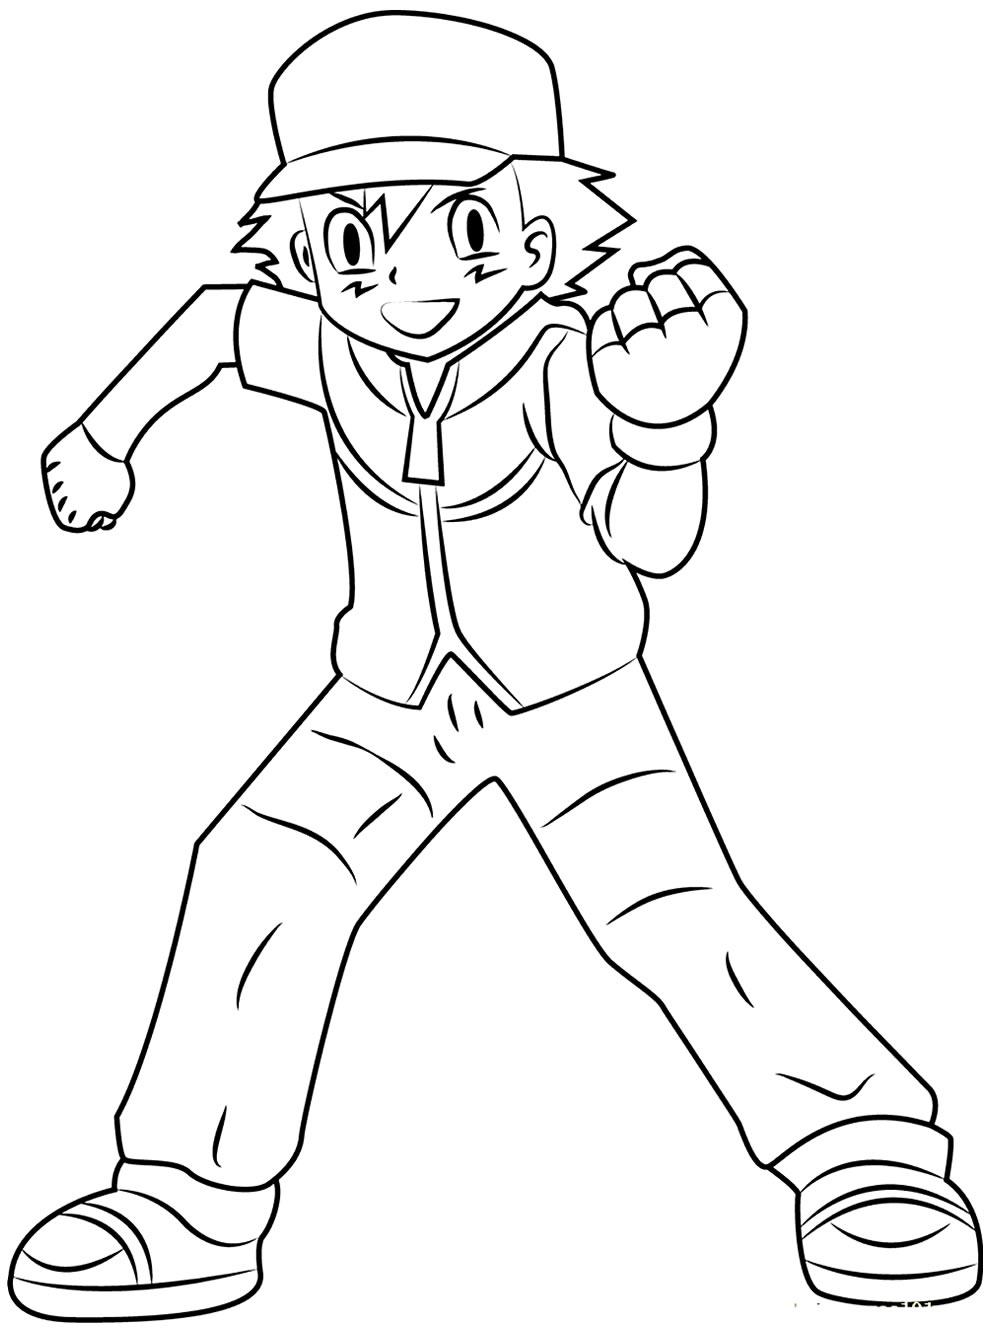 Desenho de Ash para colorir